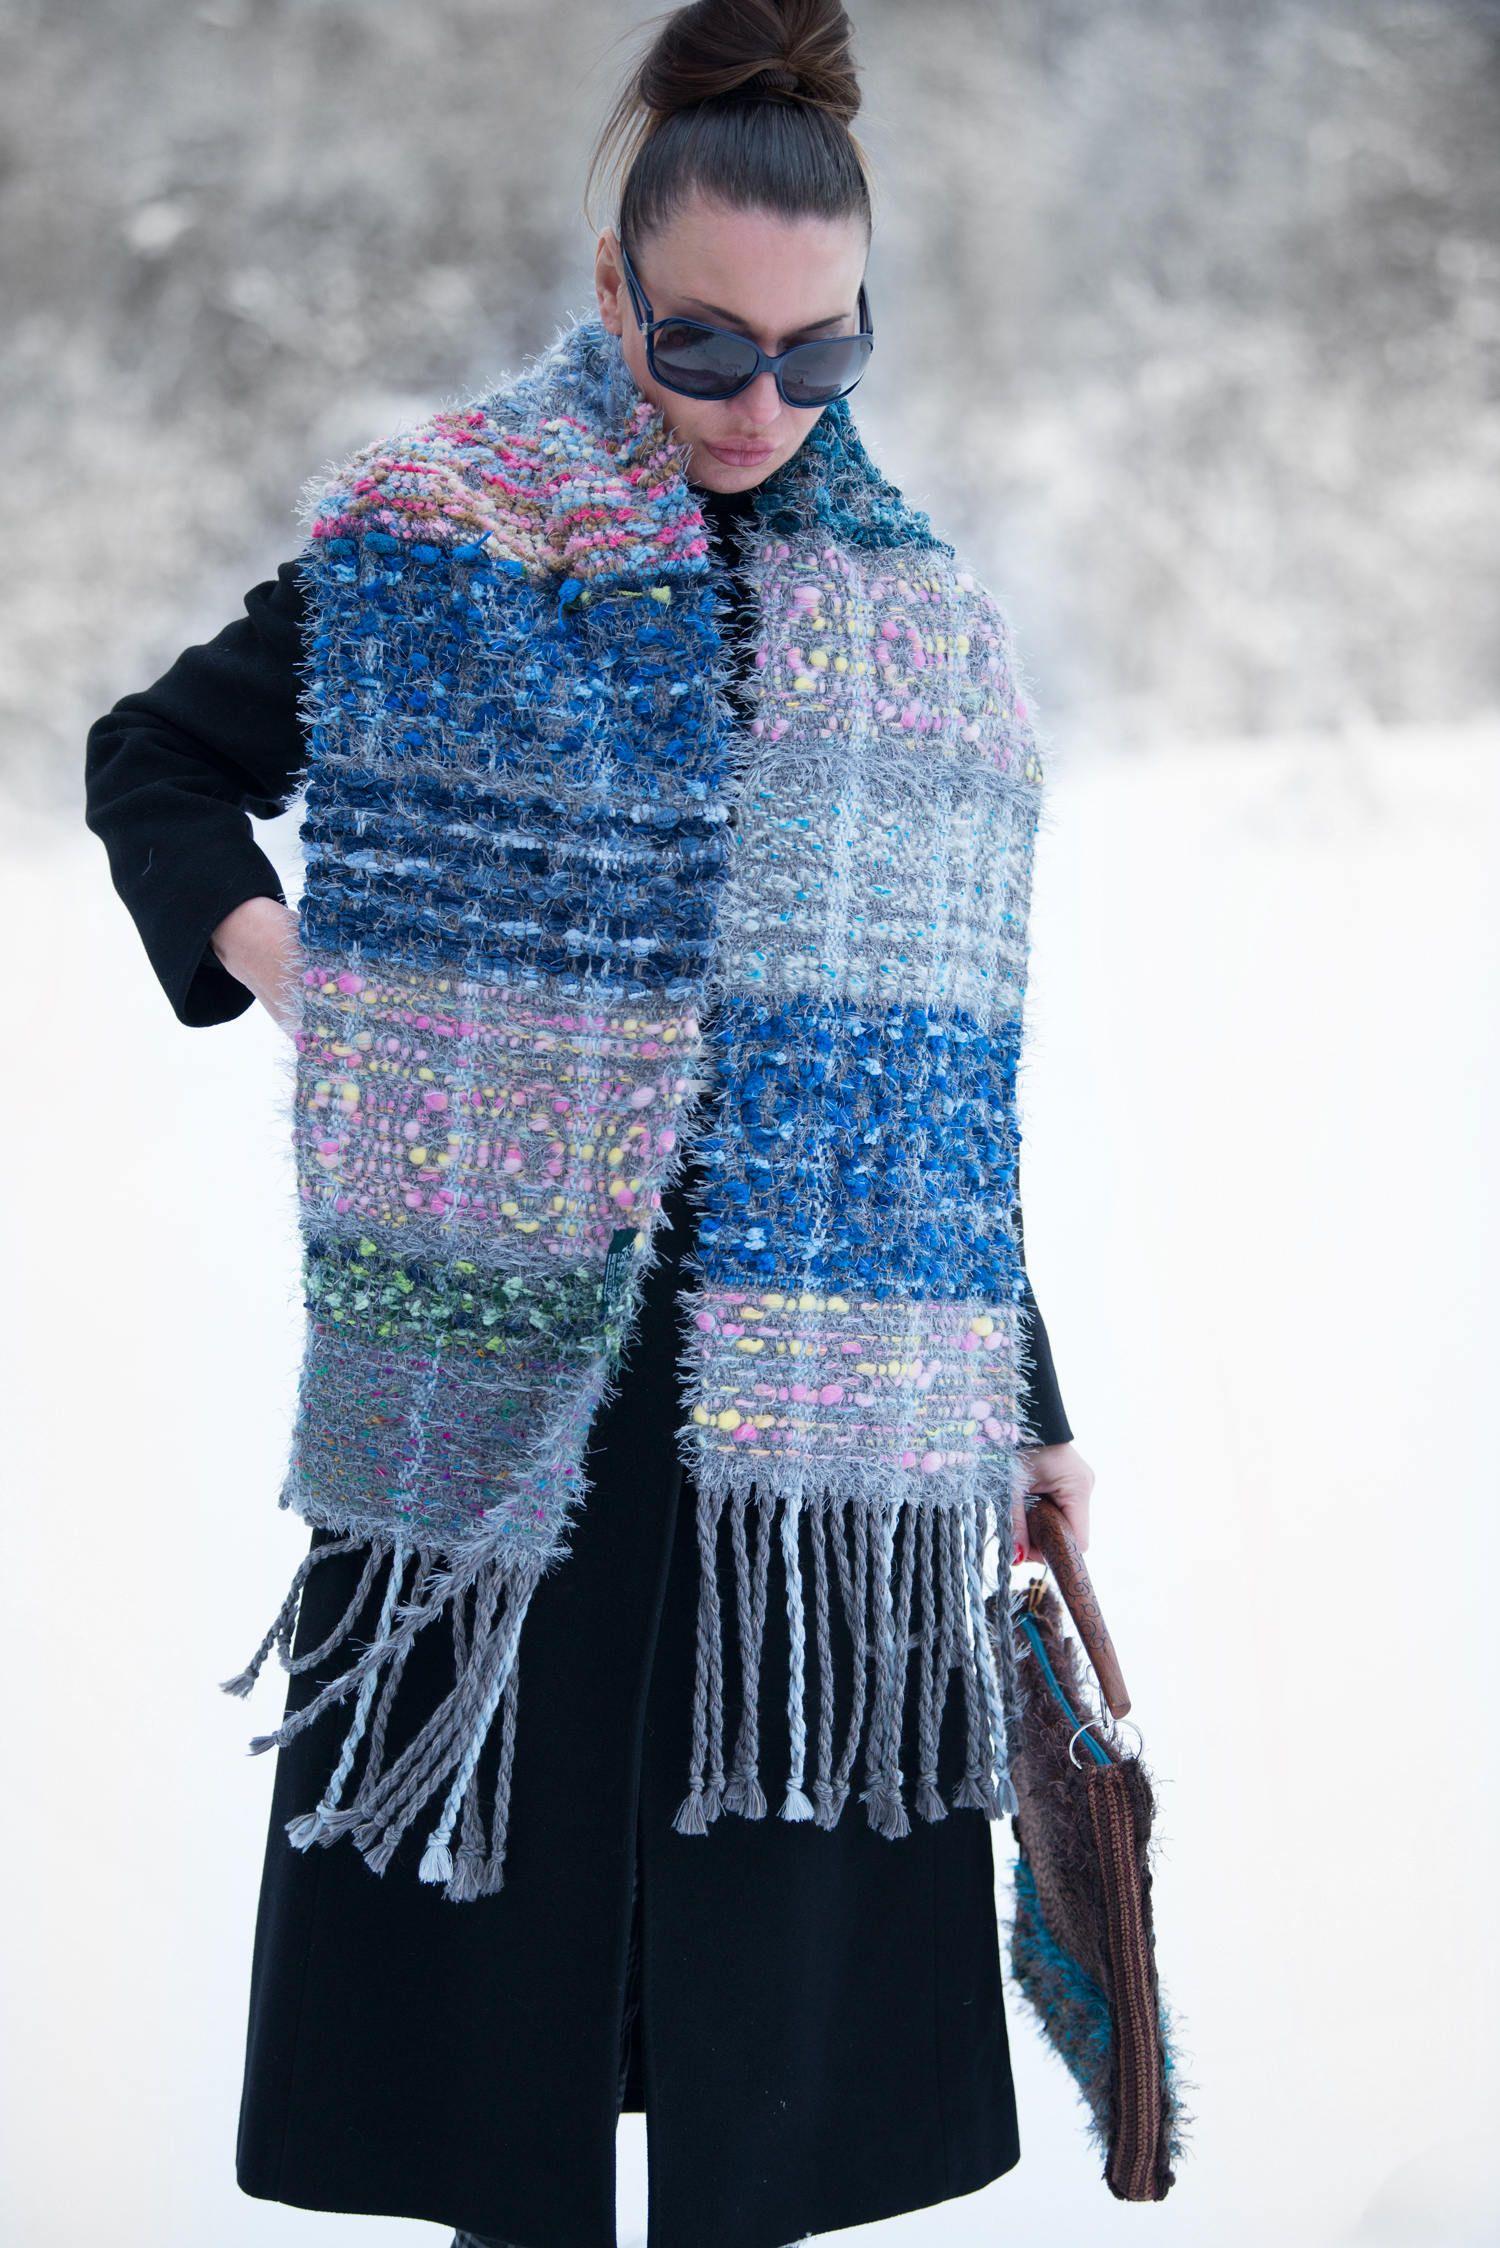 6b5c5bd0cdddb Blue Large Knit Scarf, Scarf with Fringe, Long Wool Scarf, Handmade  Oversized Scarf, Wool Handmade Fringe scarf - SC0865CKW by EUGfashion on  Etsy